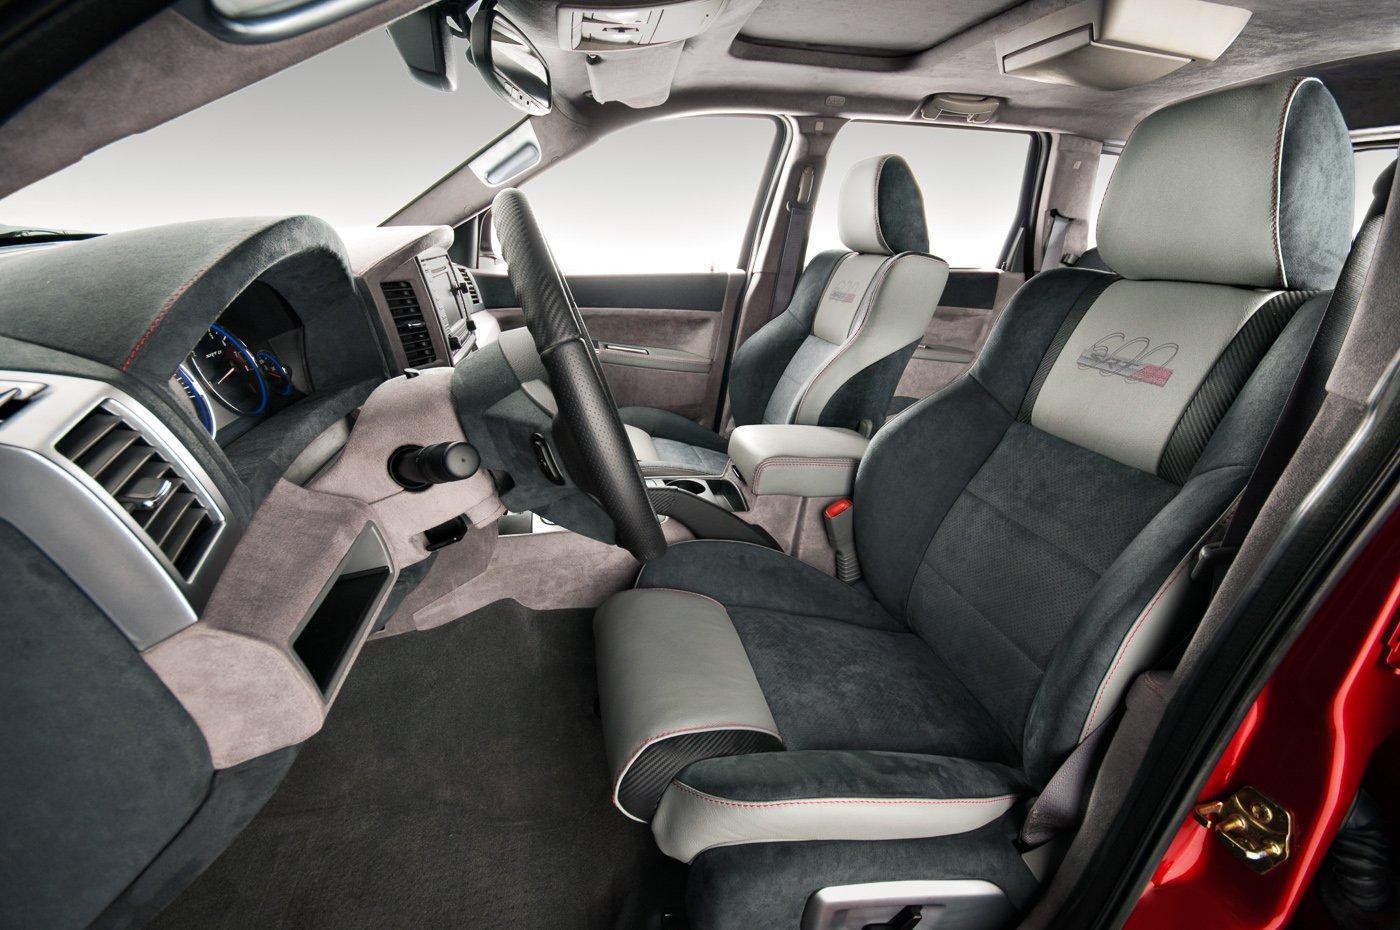 Jeep grand cherokee with custom interior - 2010 jeep grand cherokee interior ...